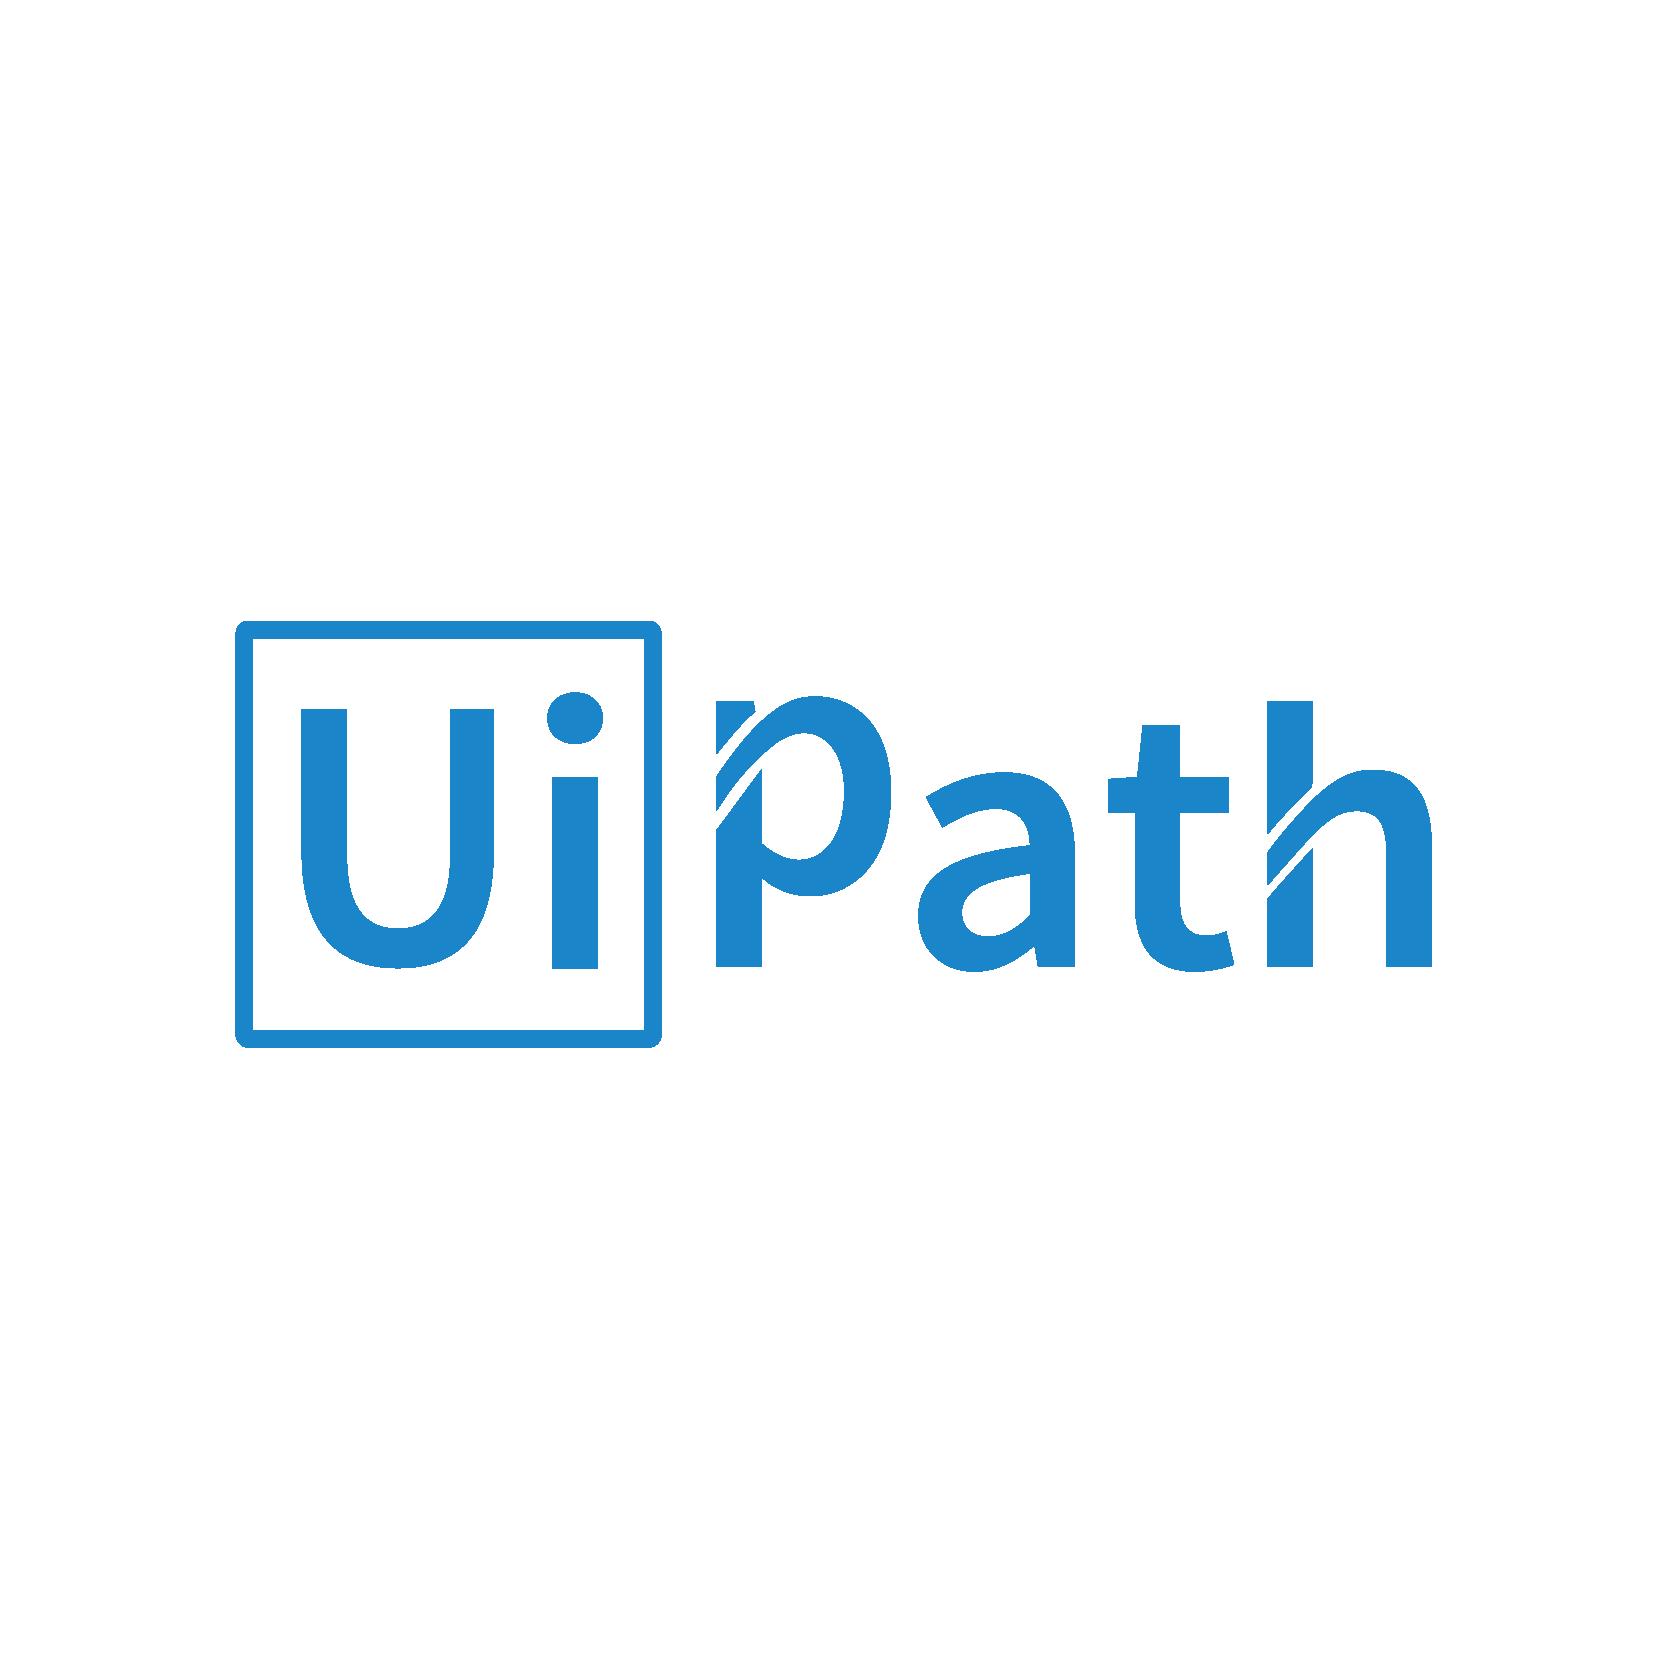 Parteneri Team Hope_2018_12. UiPath.png